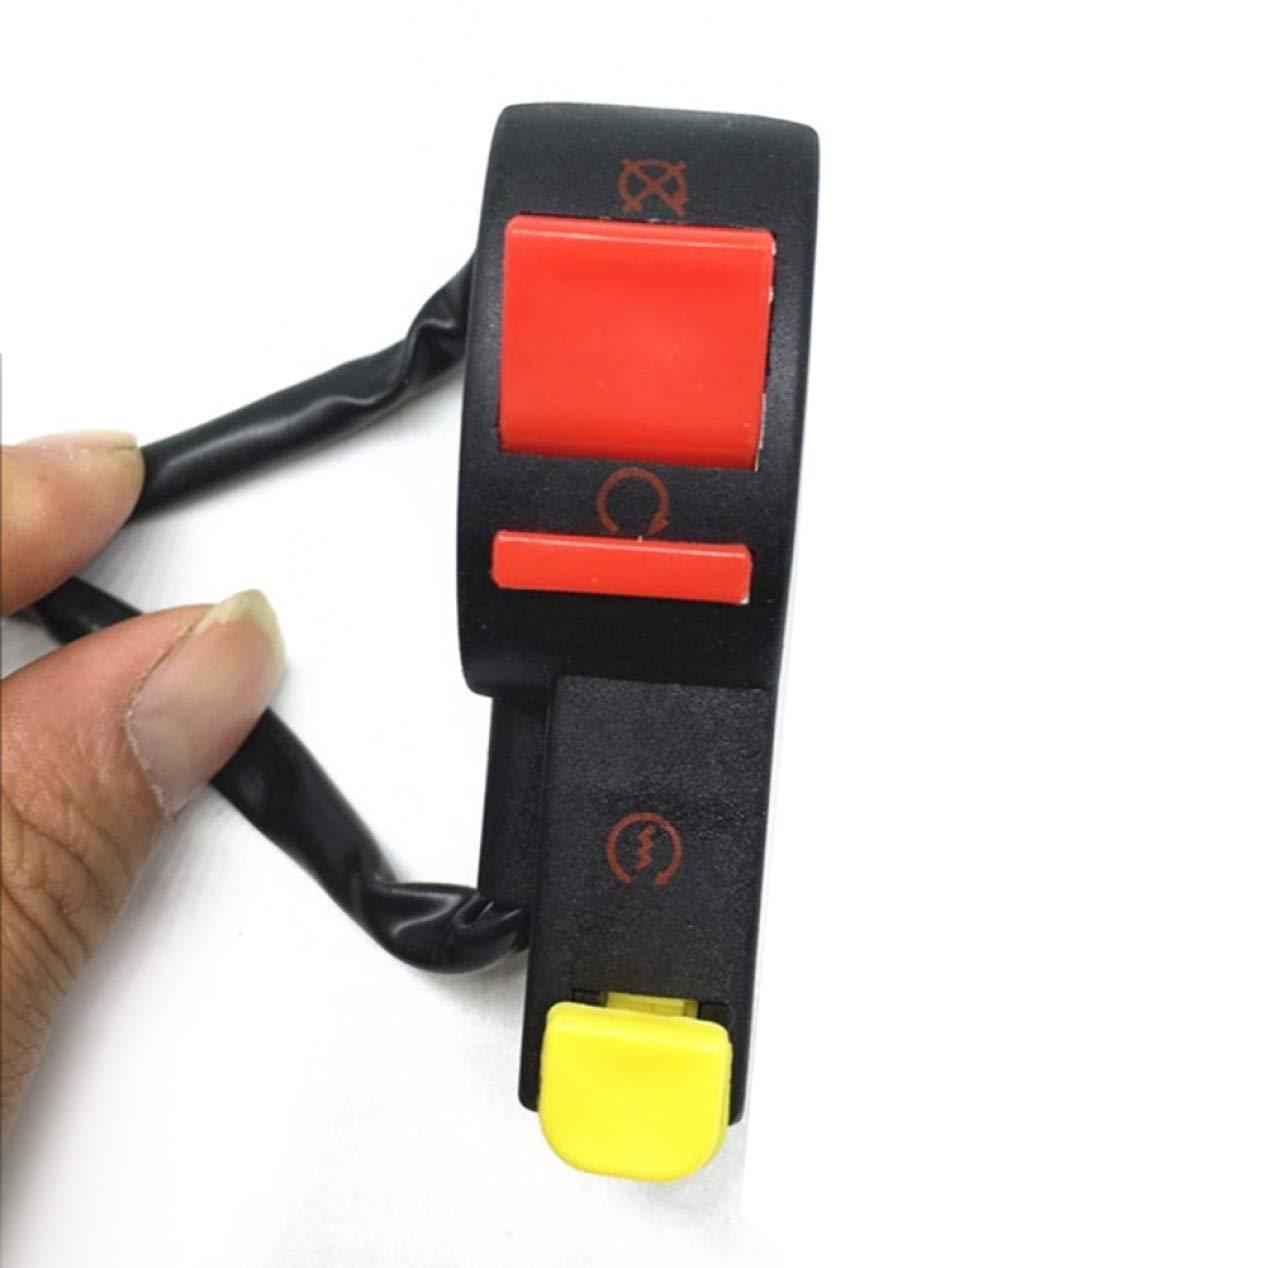 /& Stop-Schalter Knopf 4 Draht Verbindung /& Fernlicht Schalter pinruitai fabelhafte Off-Road Motorrad Elektro Starter Lenker Start